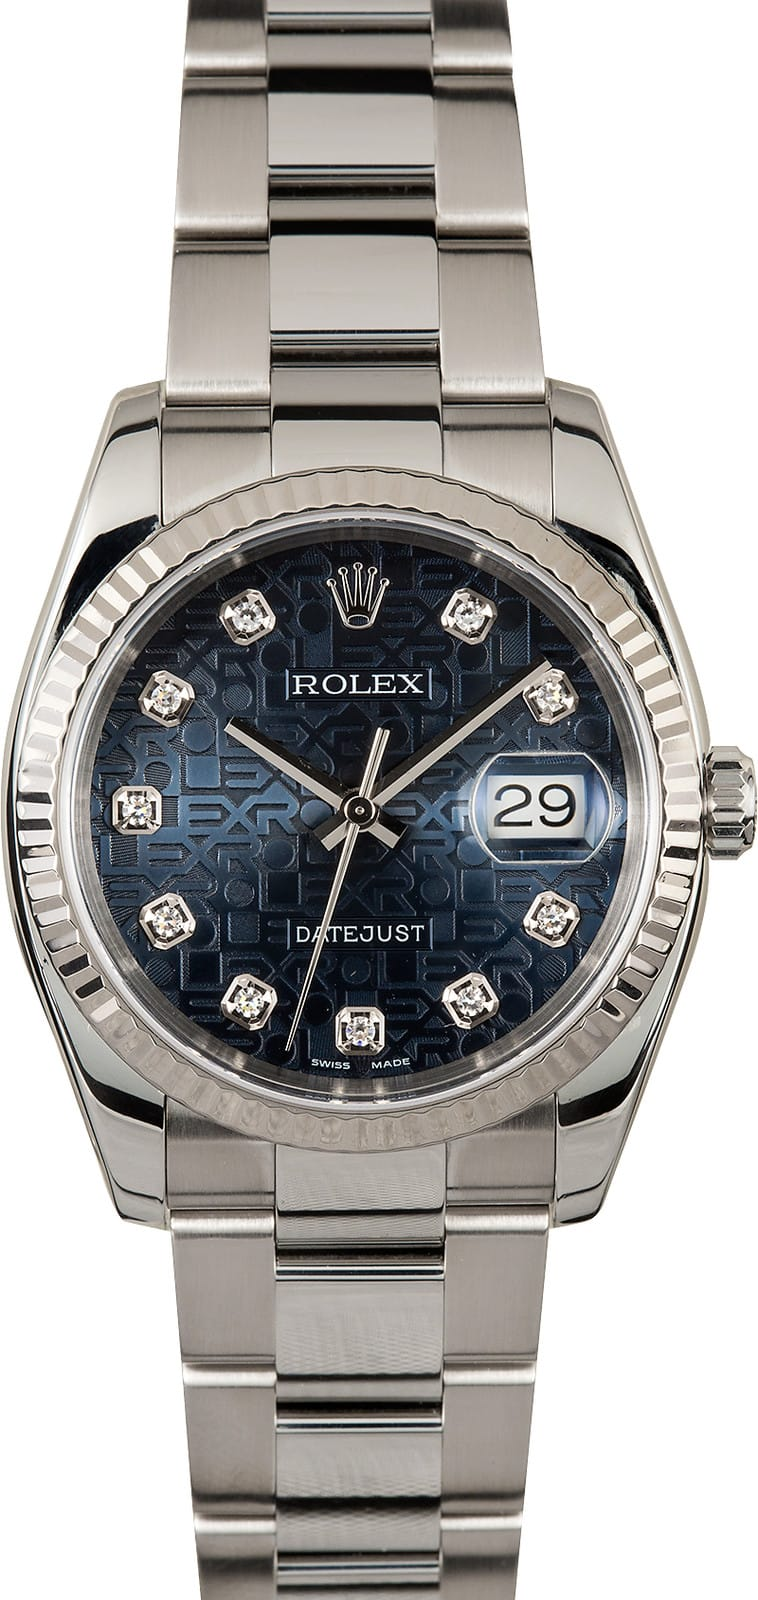 Rolex Datejust 116234 Diamond Jubilee Dial